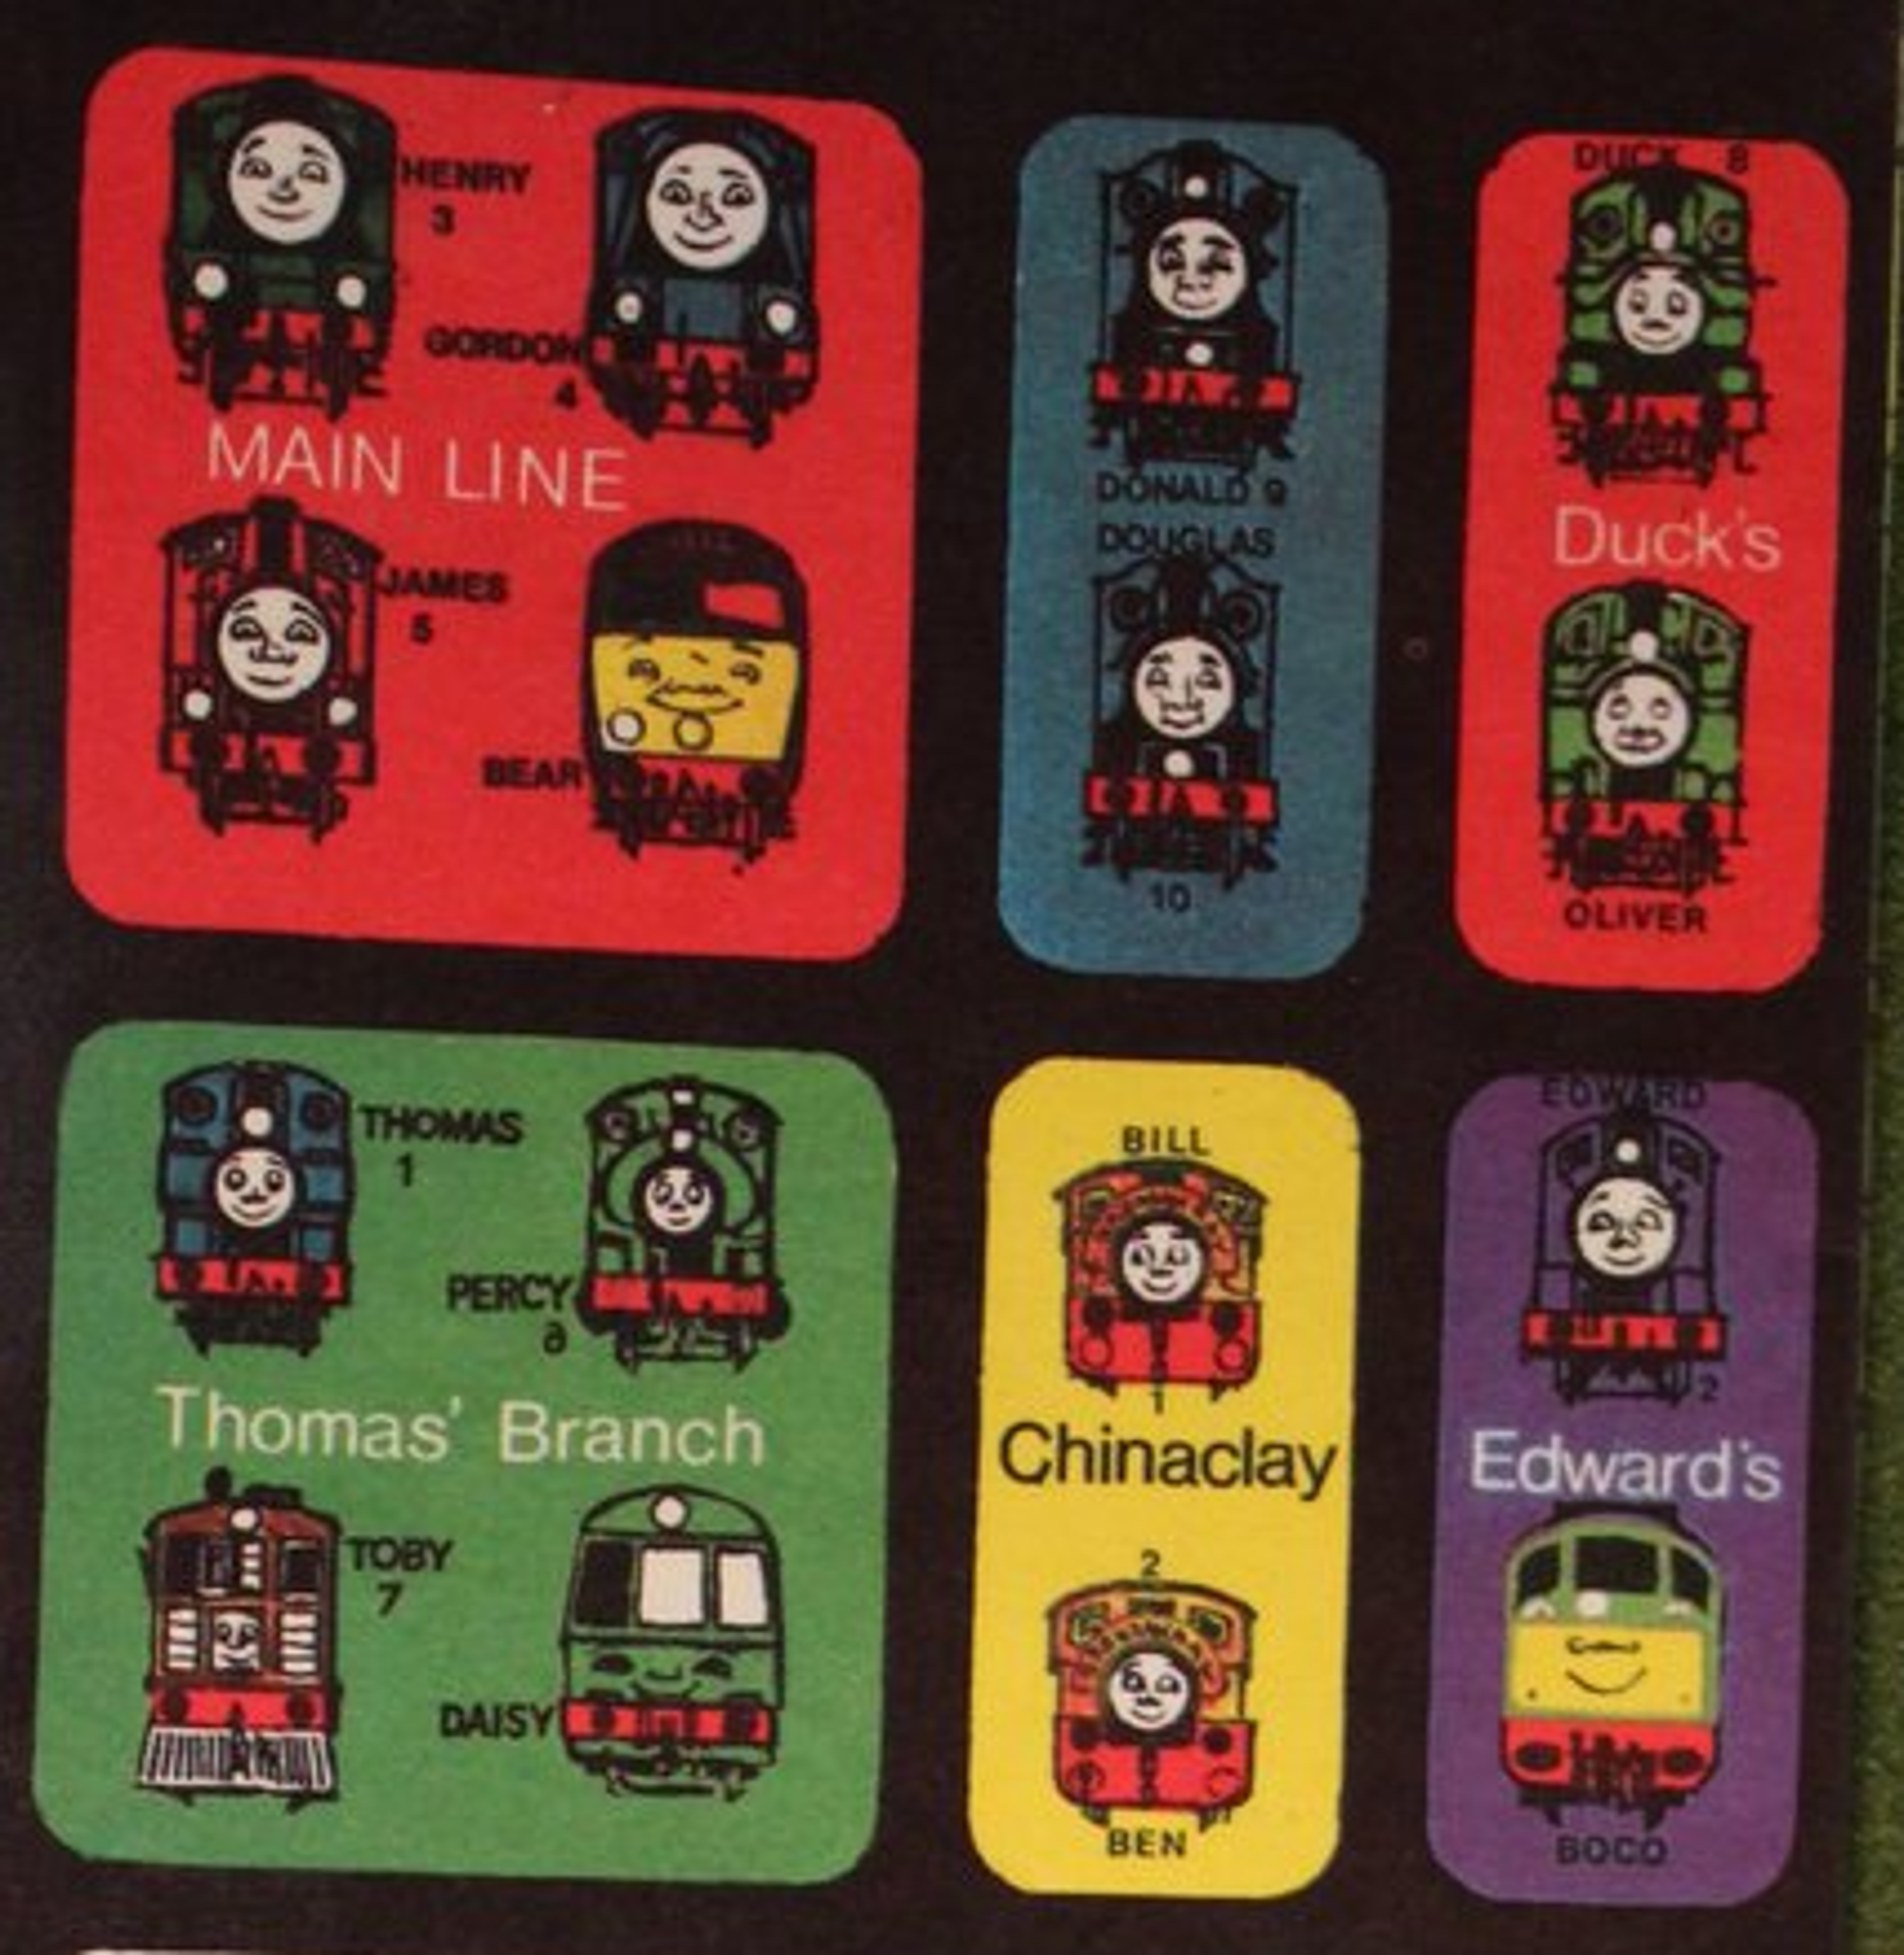 File:RailwayMap4.png